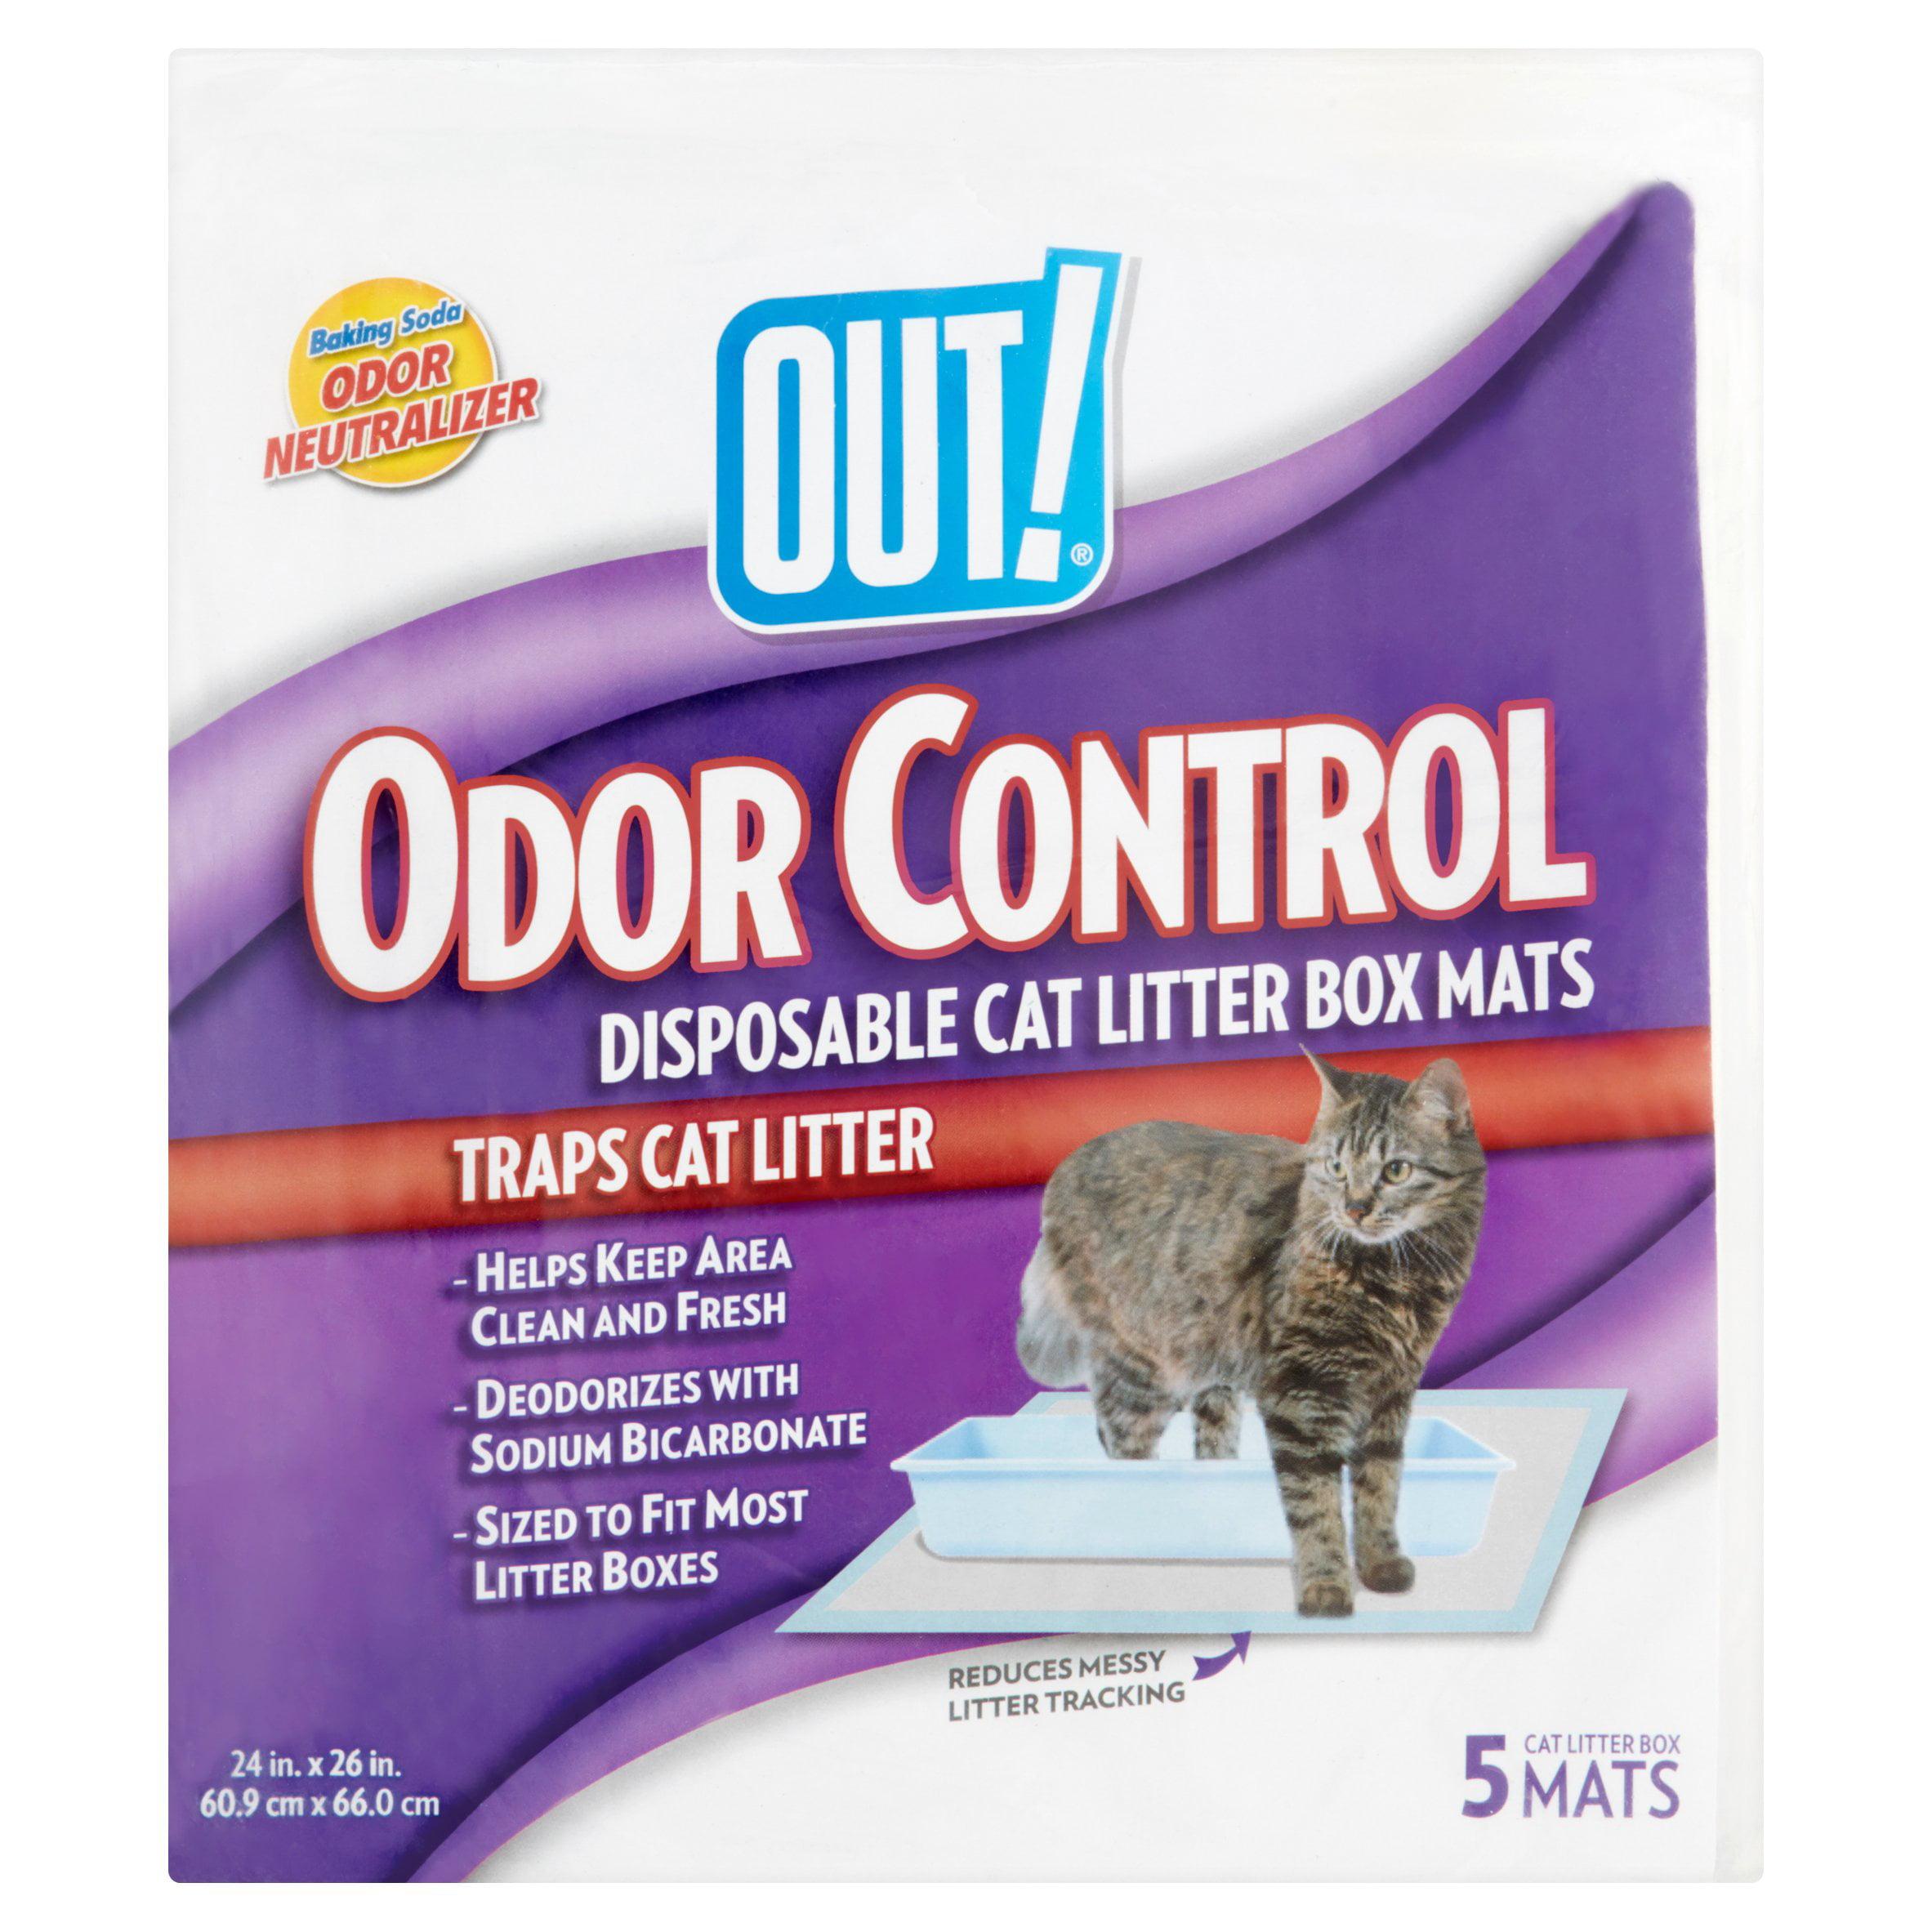 diet australia mature stockcom place matted mat amazon food litter science fur mats etsy cat